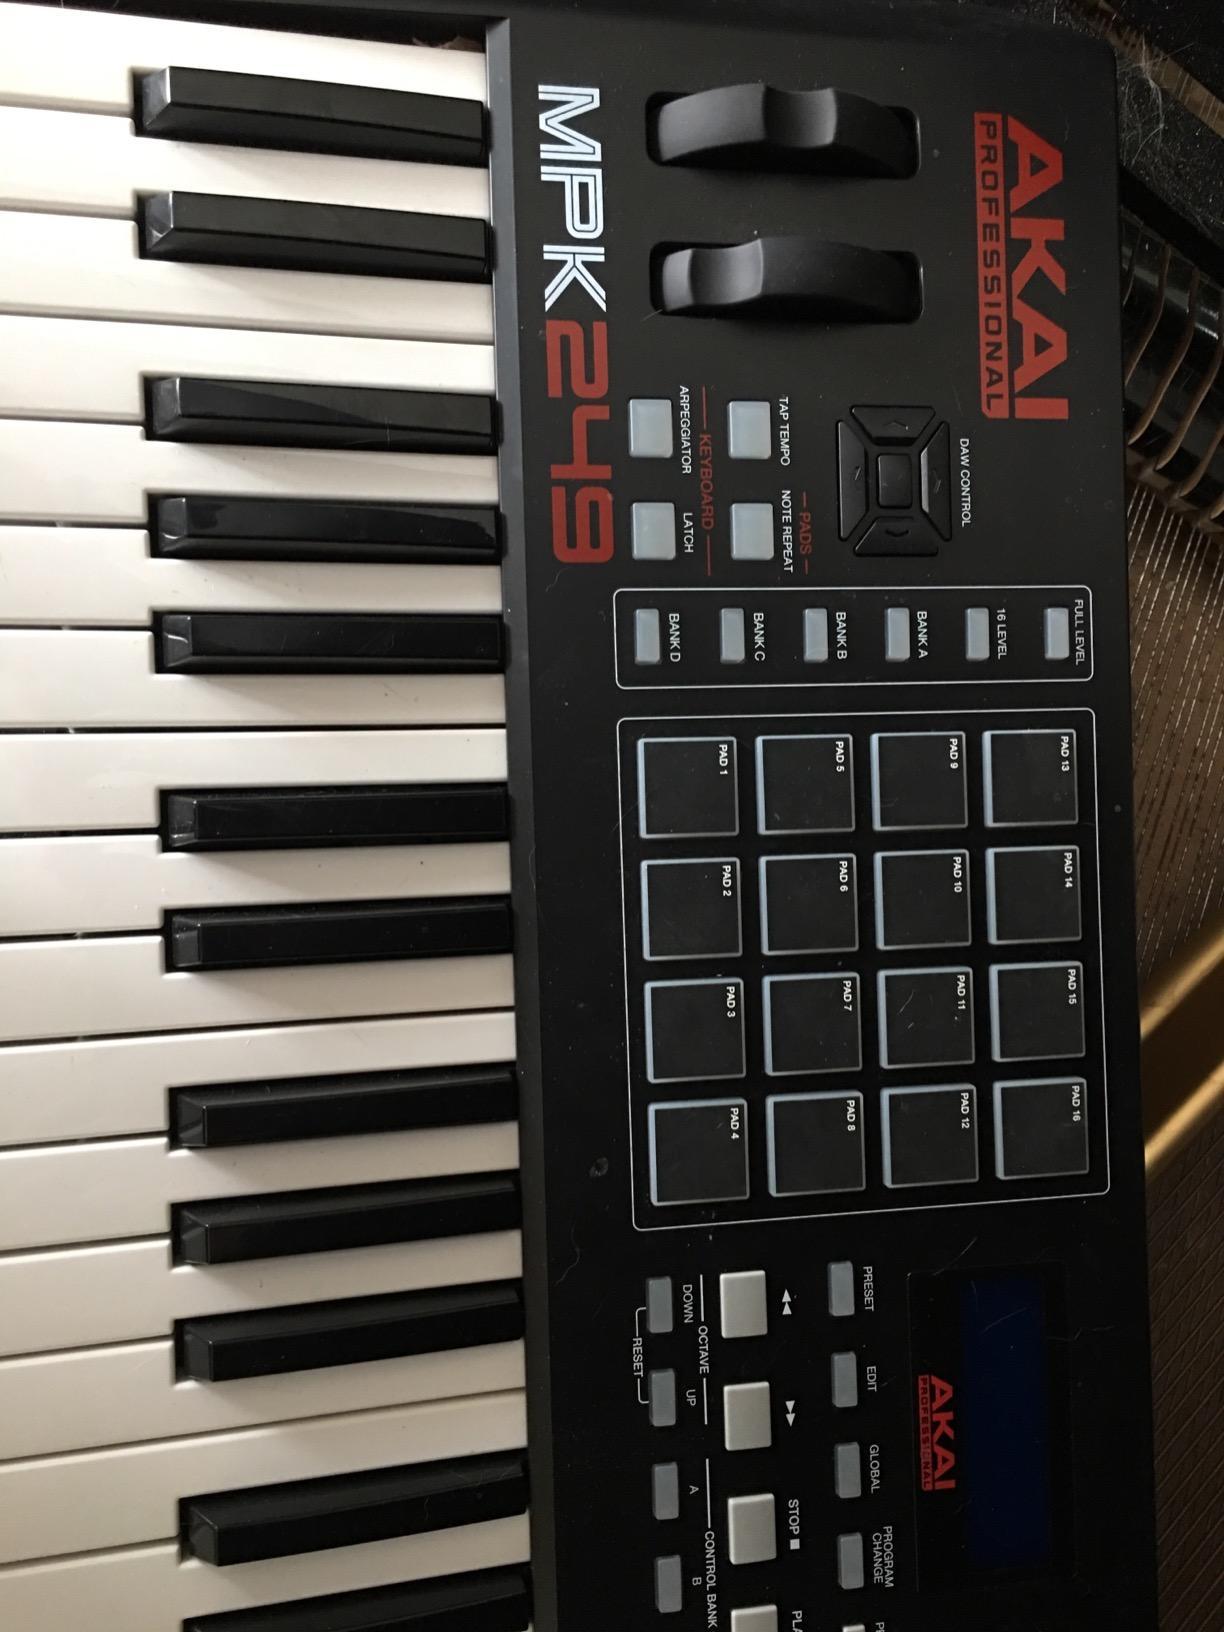 Akai Professional MPK225 | Compact 25-Key Semi-Weighted USB MIDI